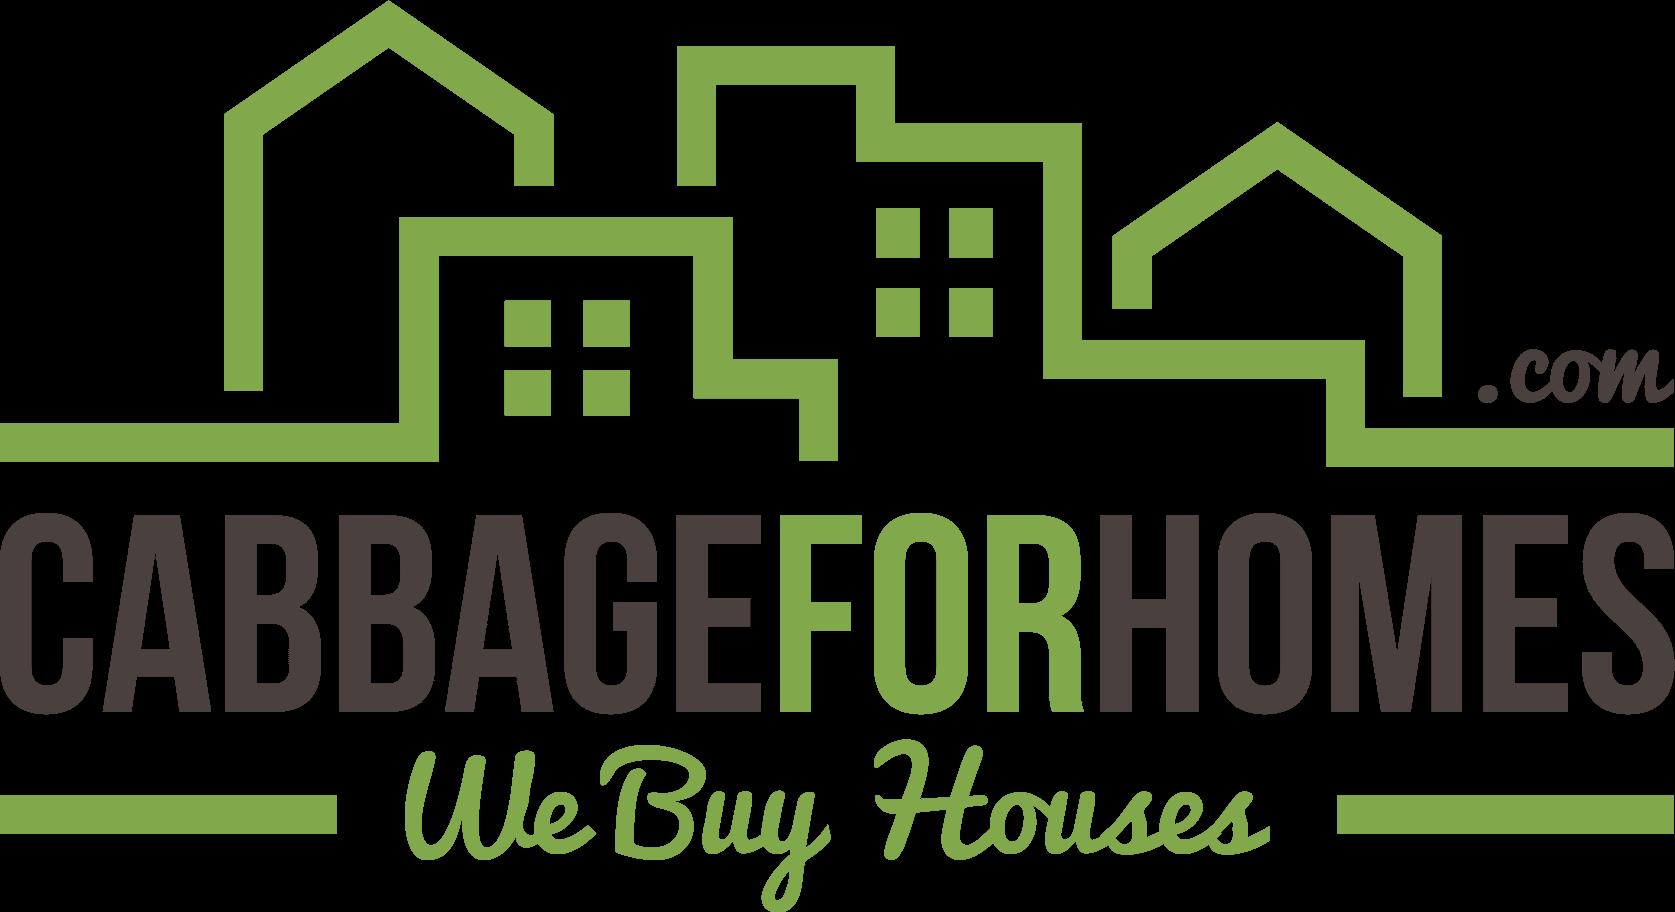 CabbageForHomes logo